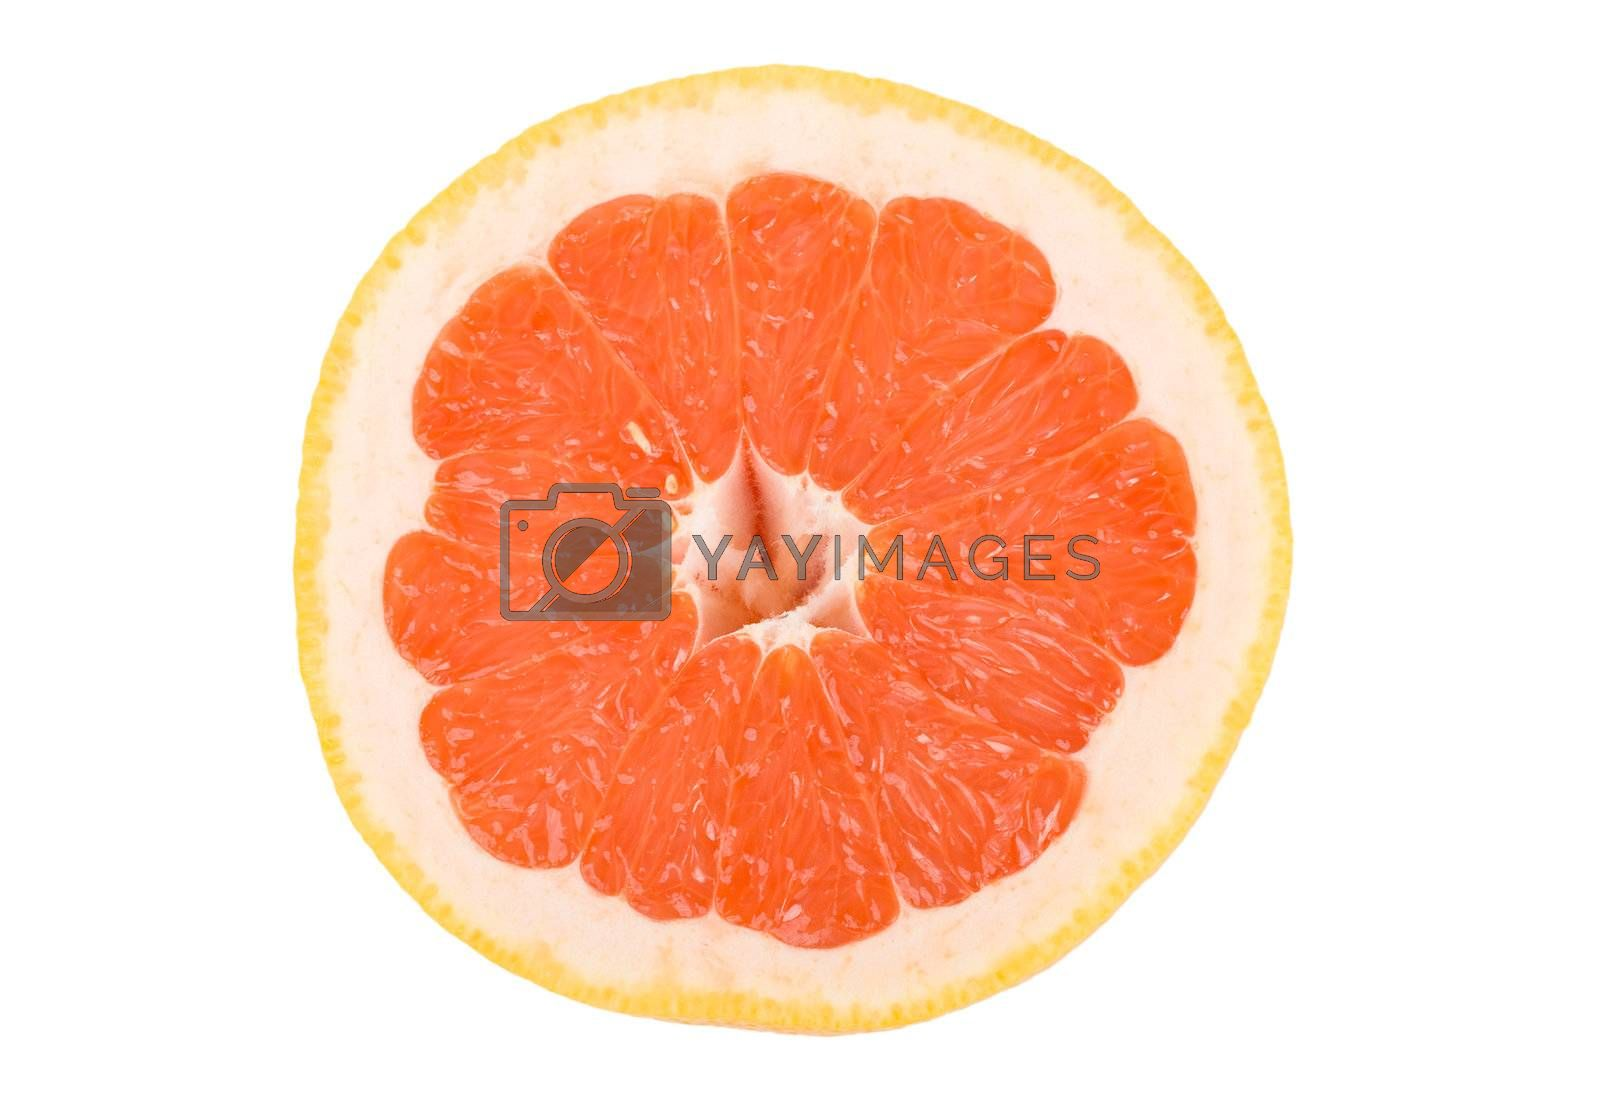 close-up grapefruit peace, isolated on white